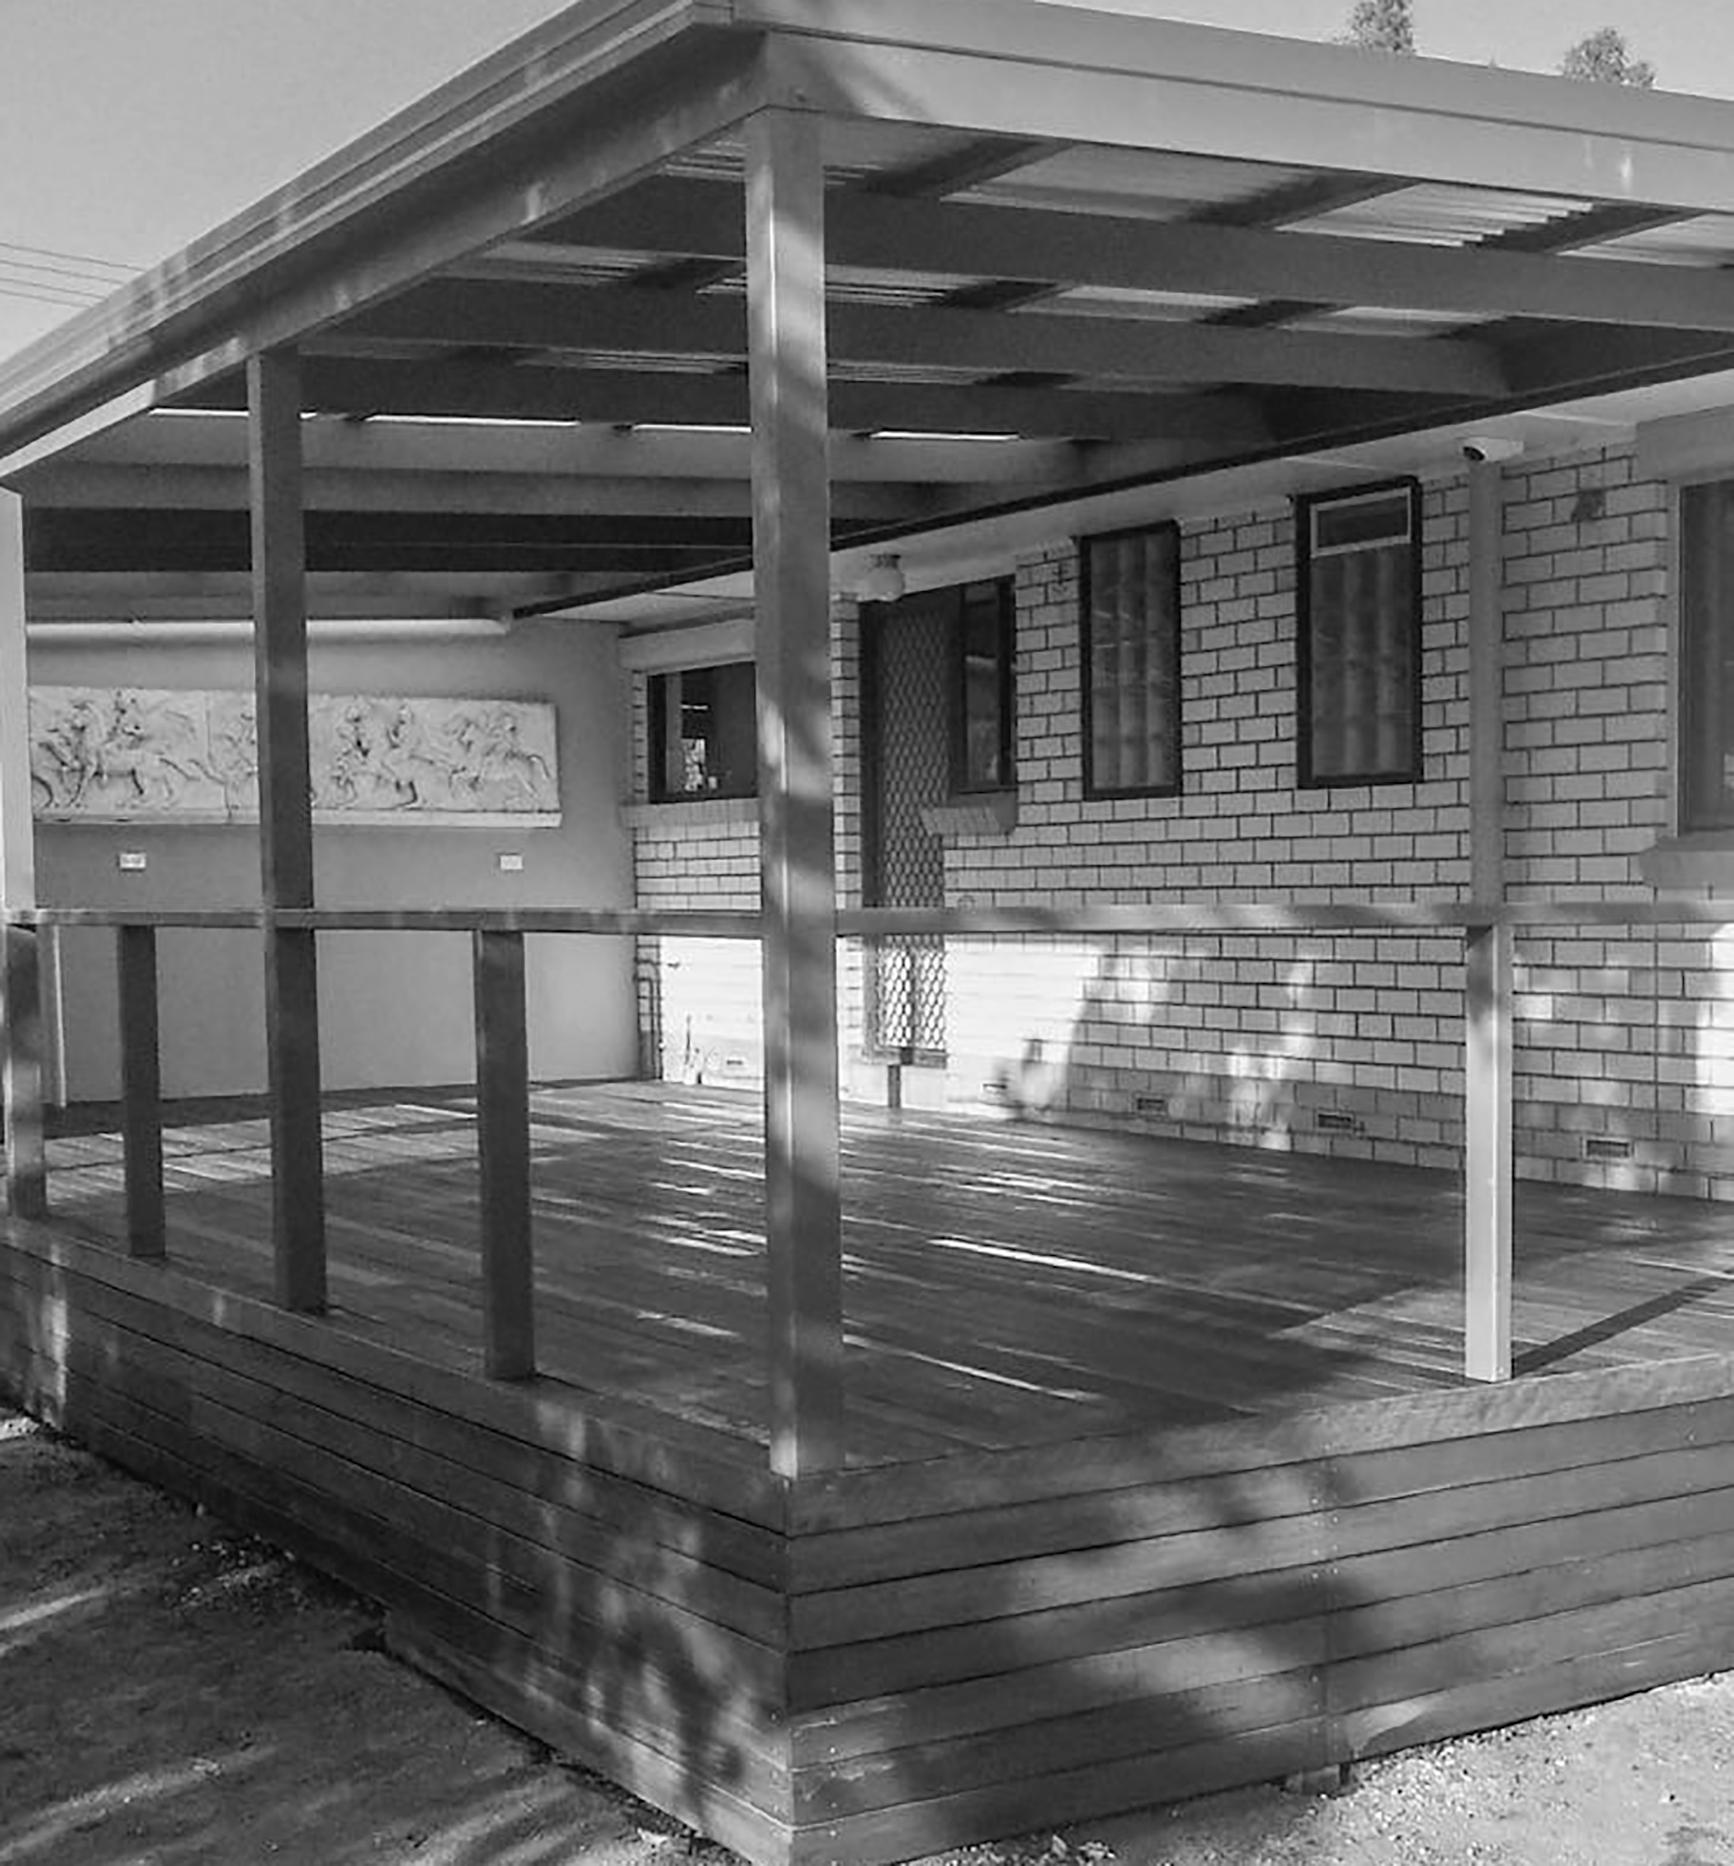 Pergola Designs In Sydney: Design And Build A Pergola Over A Deck · Pergolas Sydney